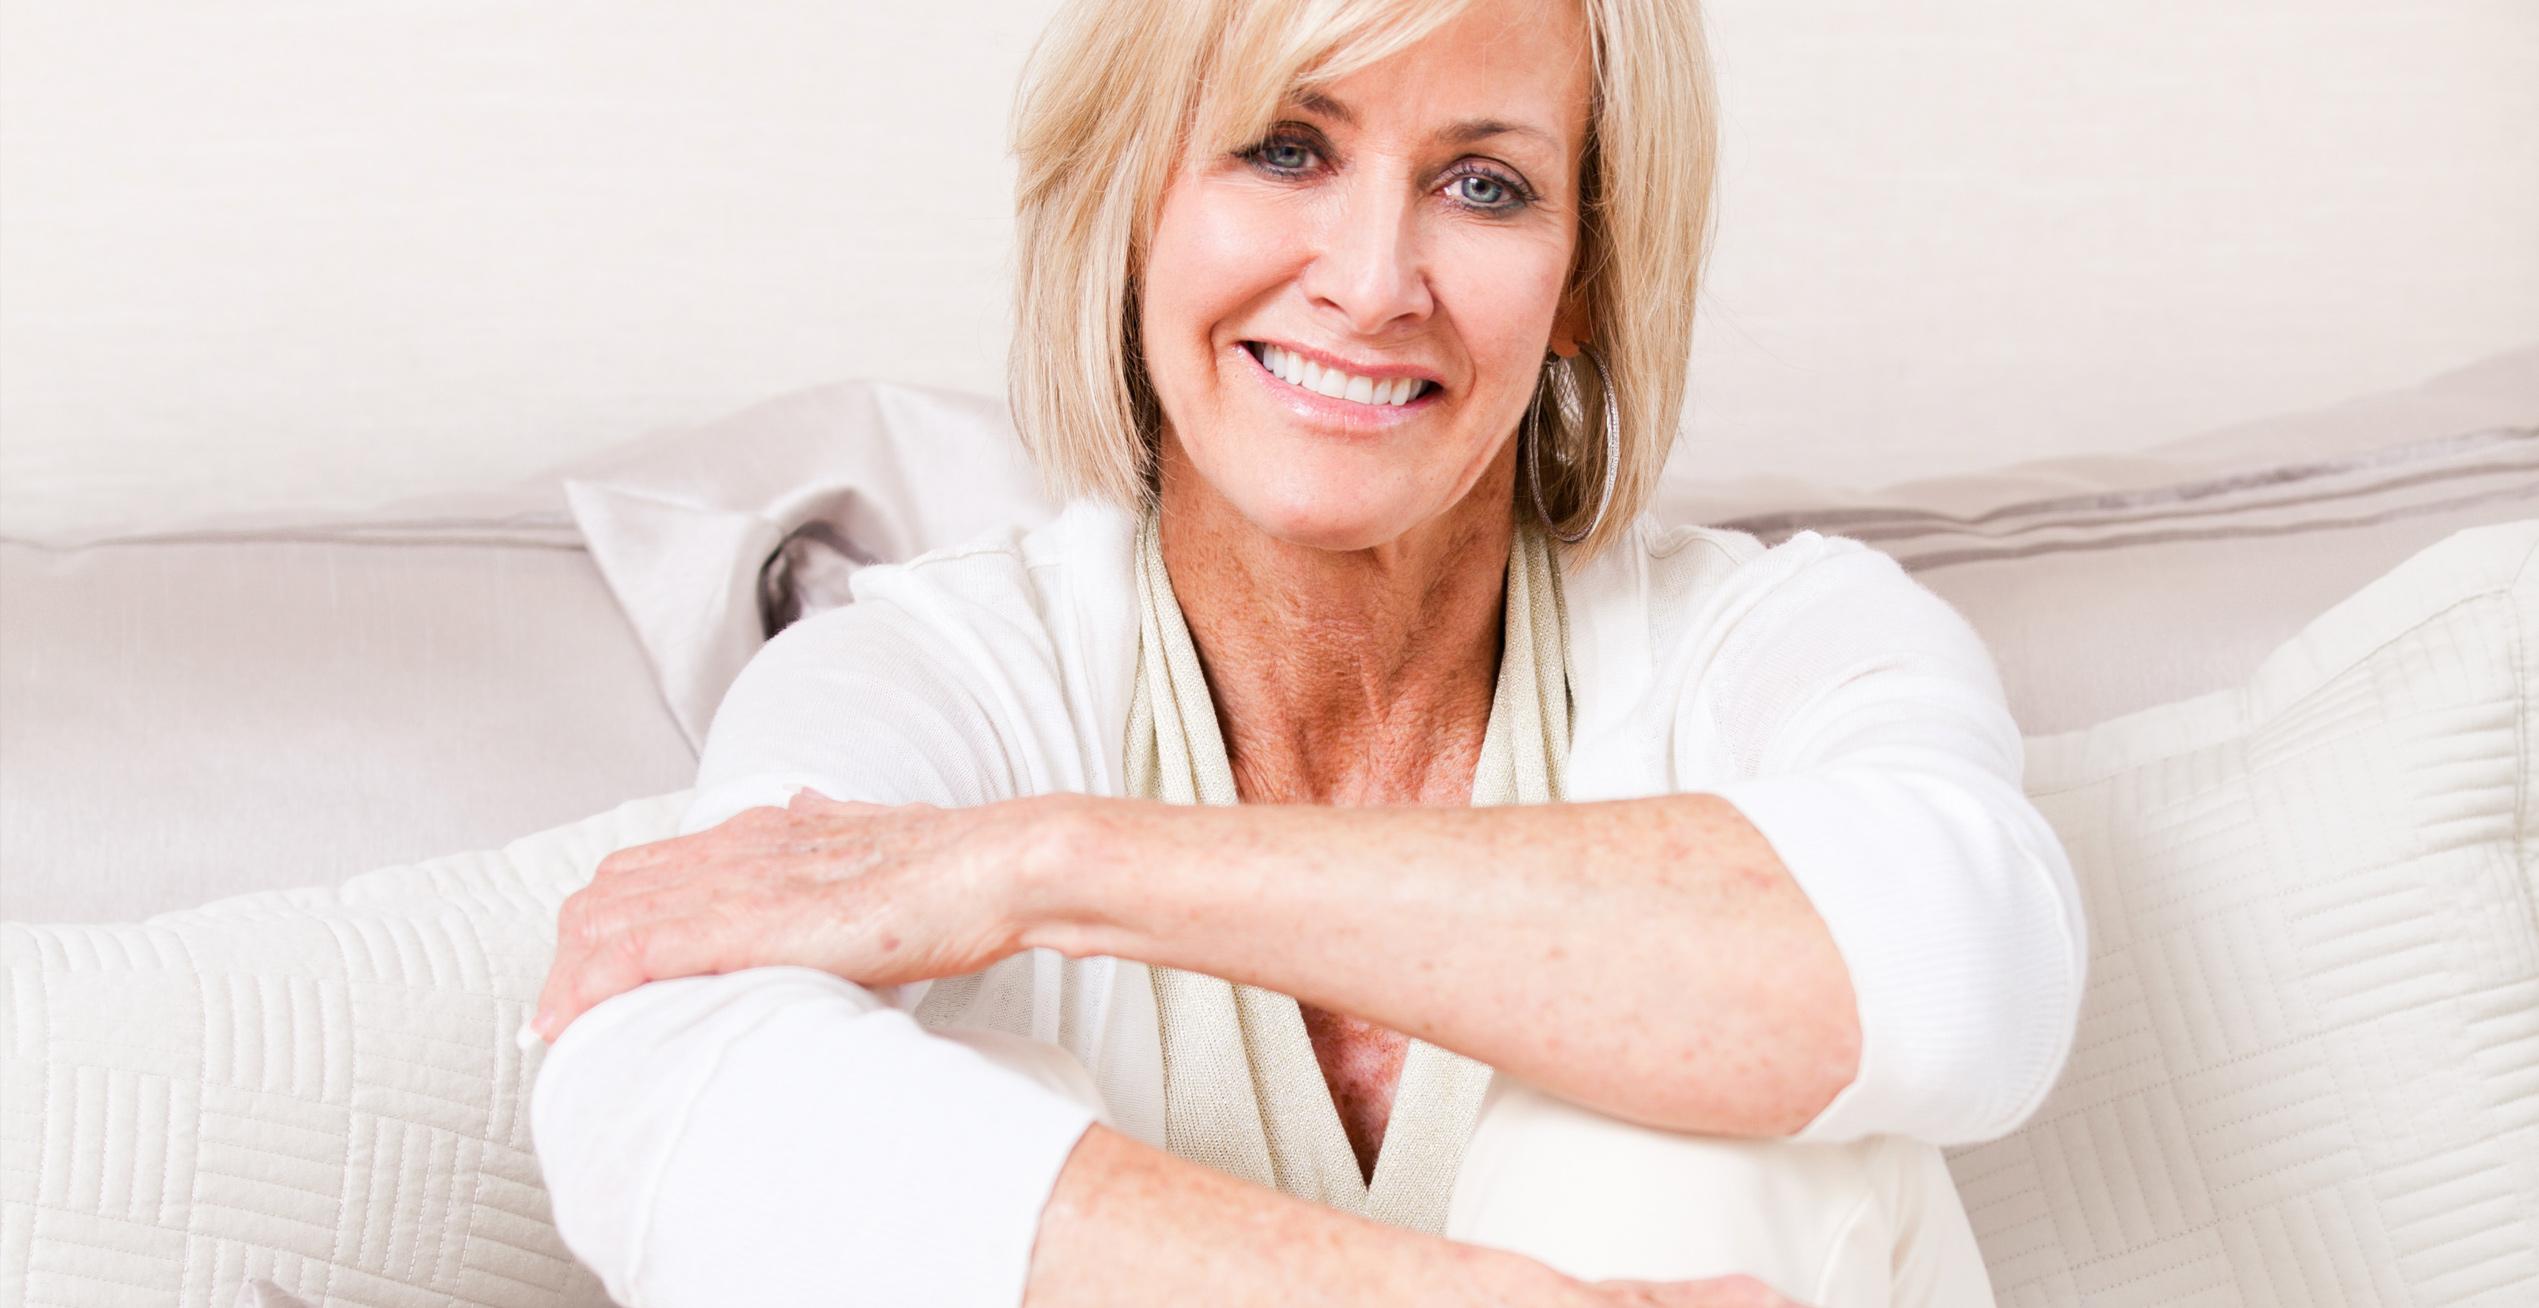 Pelvic Pain - A Main Symptom of Endometriosis